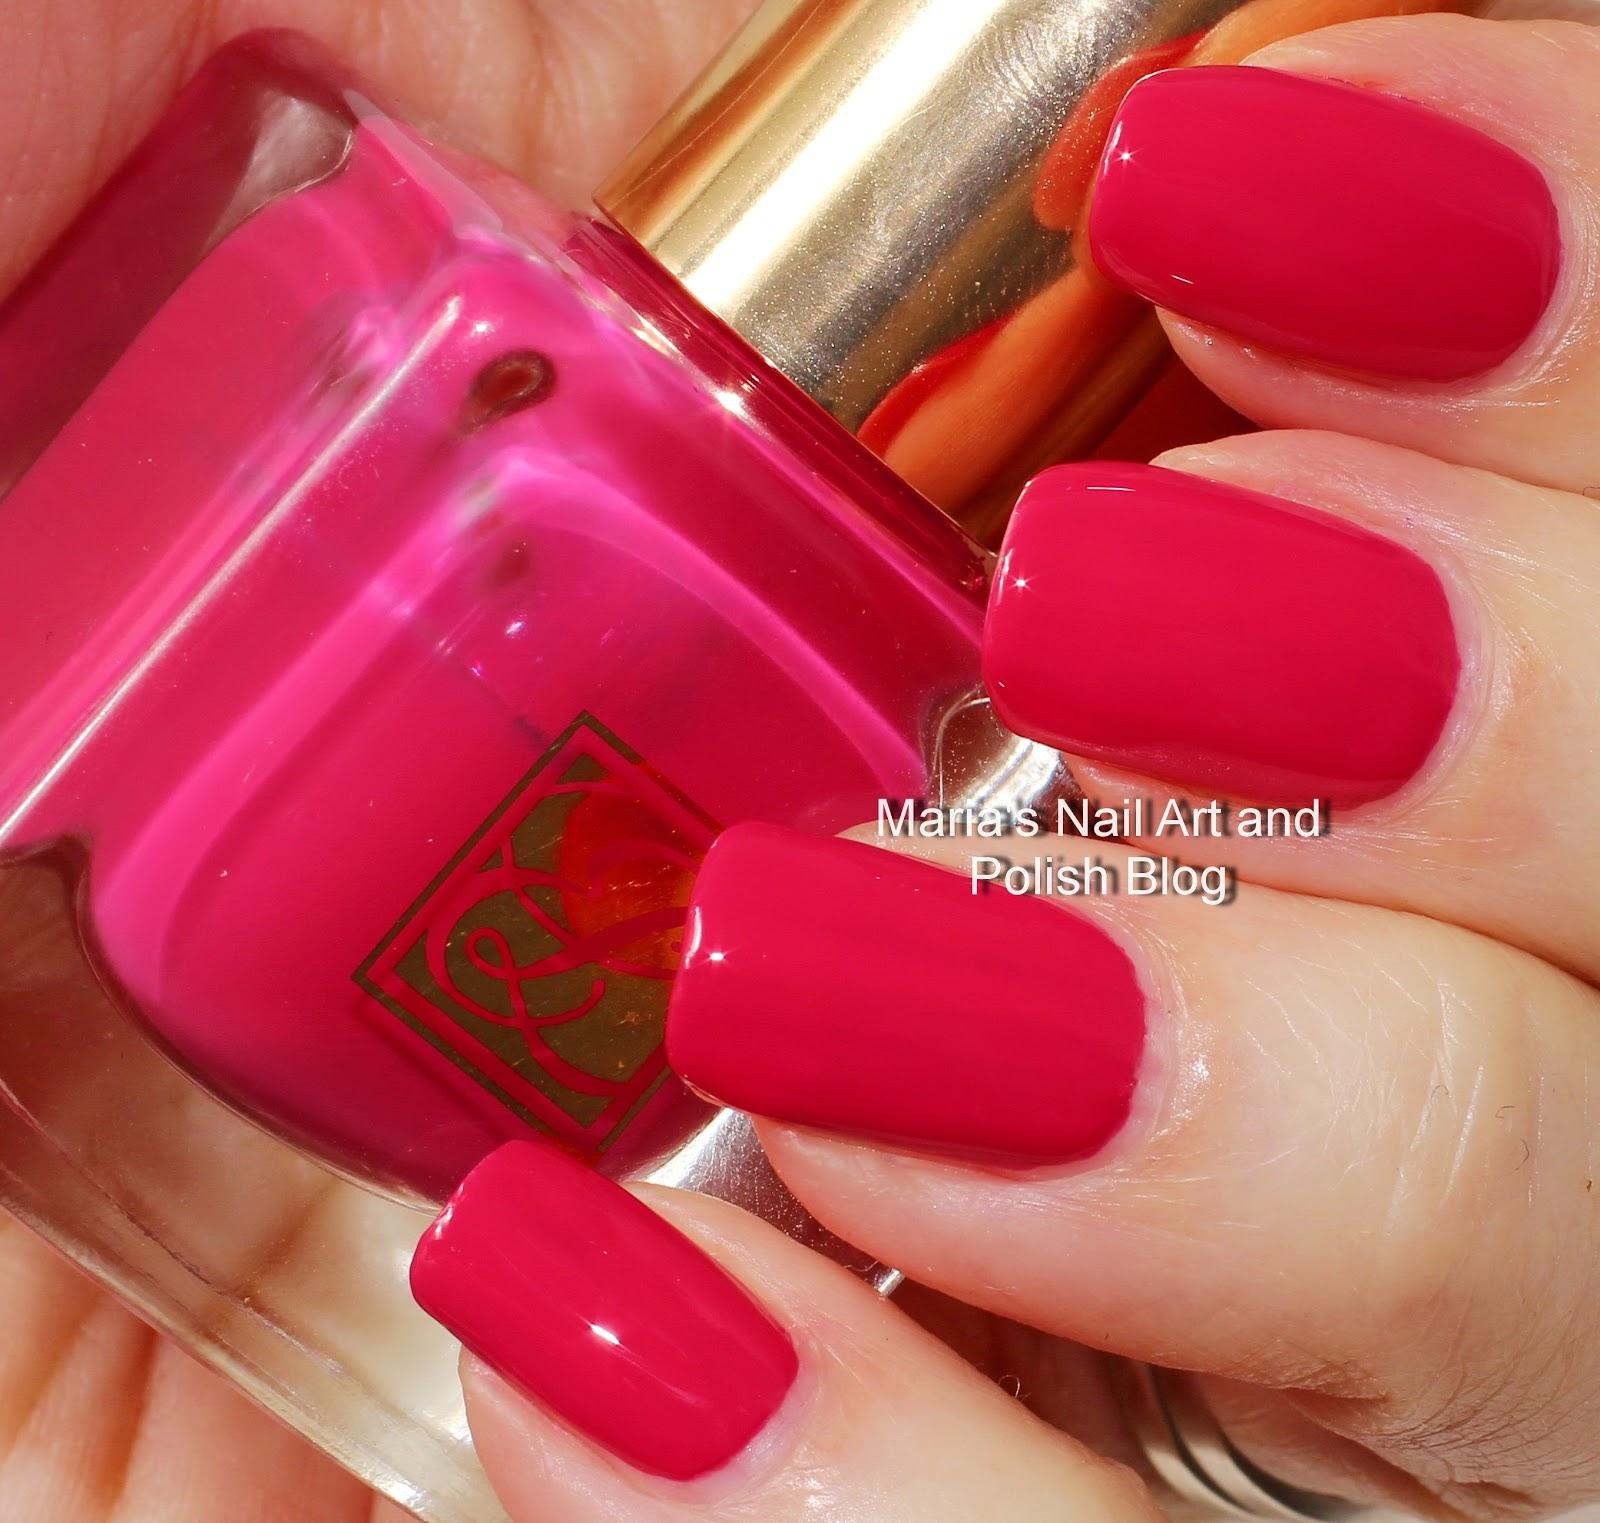 Marias Nail Art and Polish Blog: Estee Lauder 20 Hot Fuchsia ...